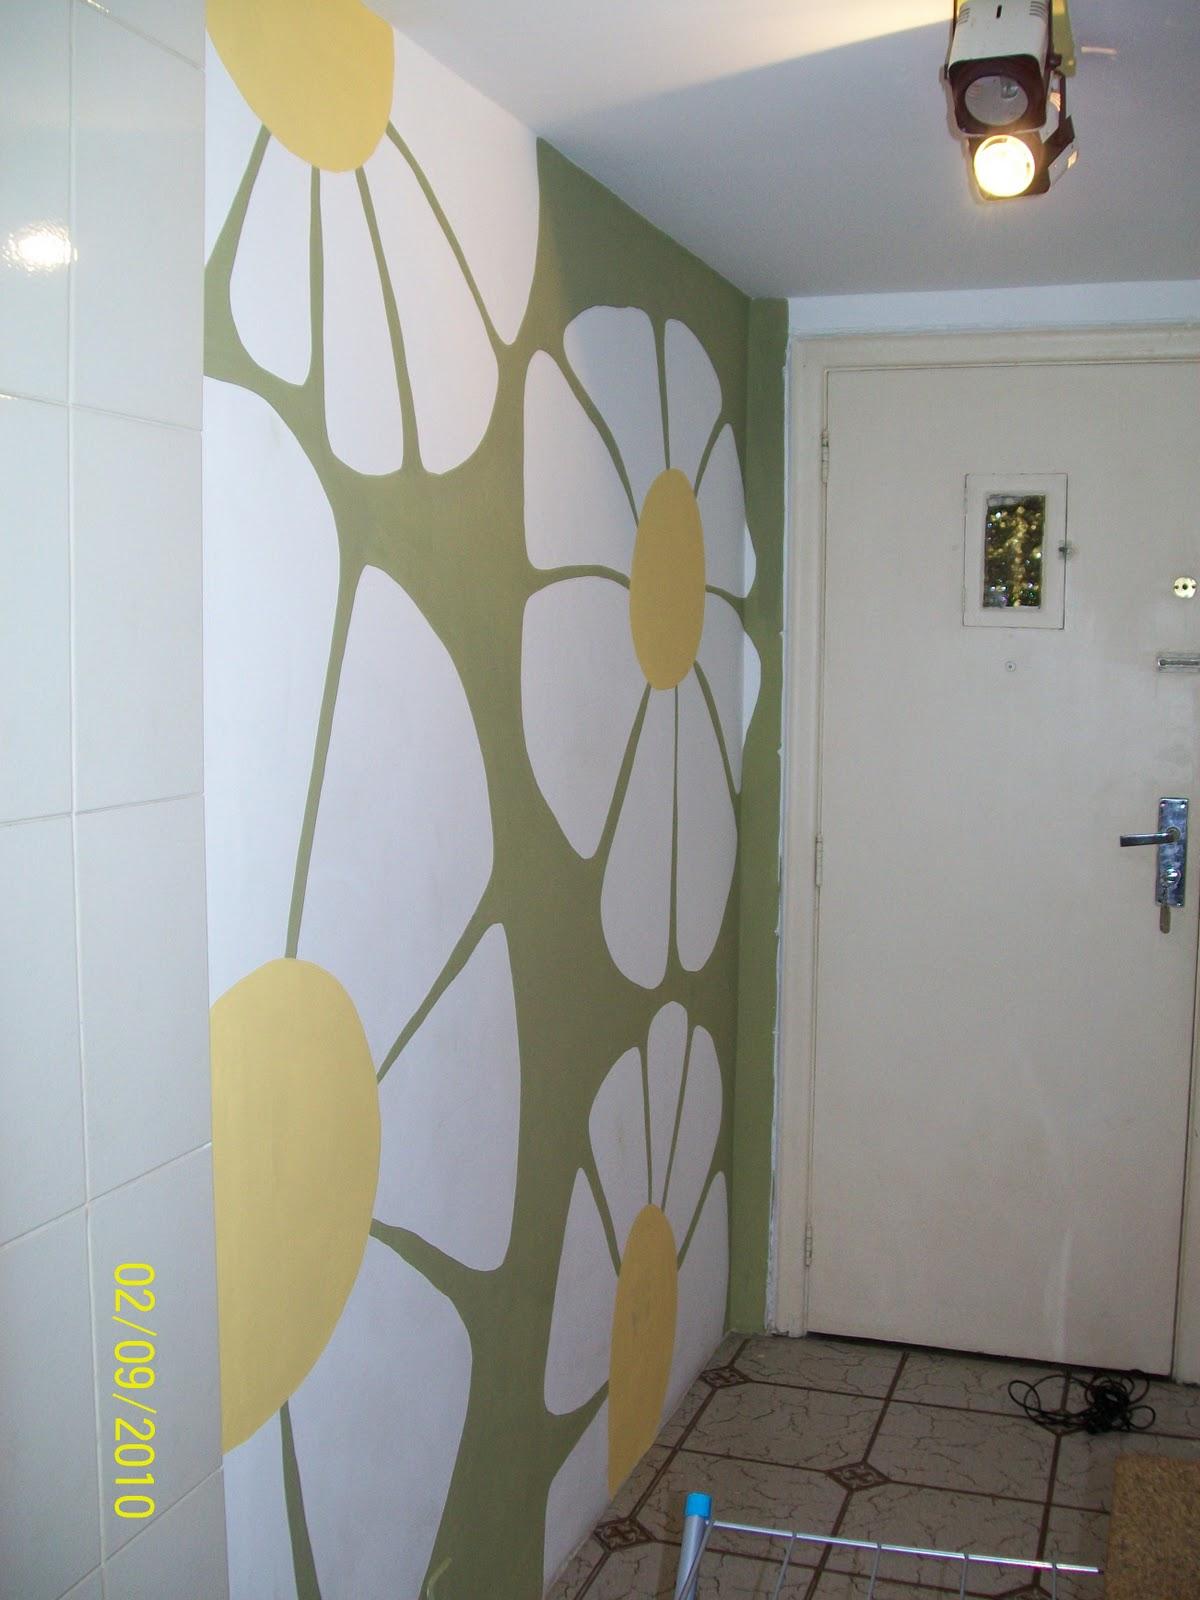 L pis tinta colorido pinturas de parede decorativas - Pintura para pared lavable ...